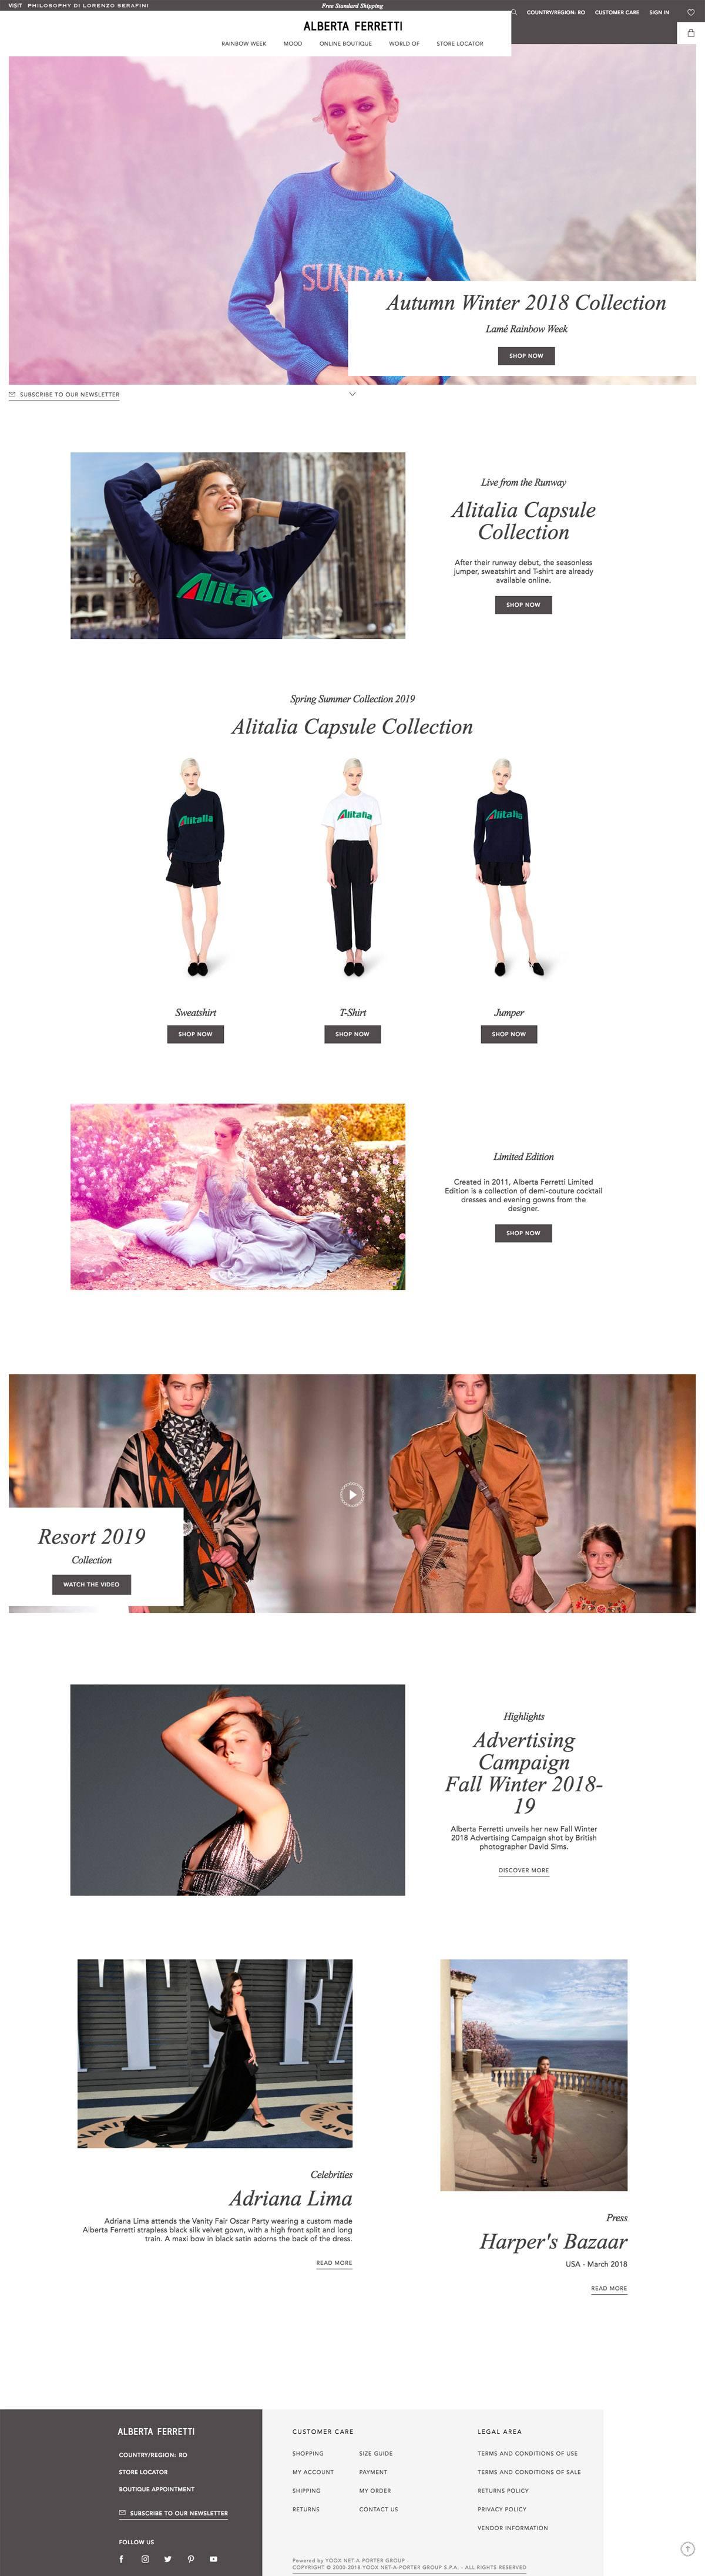 eCommerce website: Alberta Ferretti